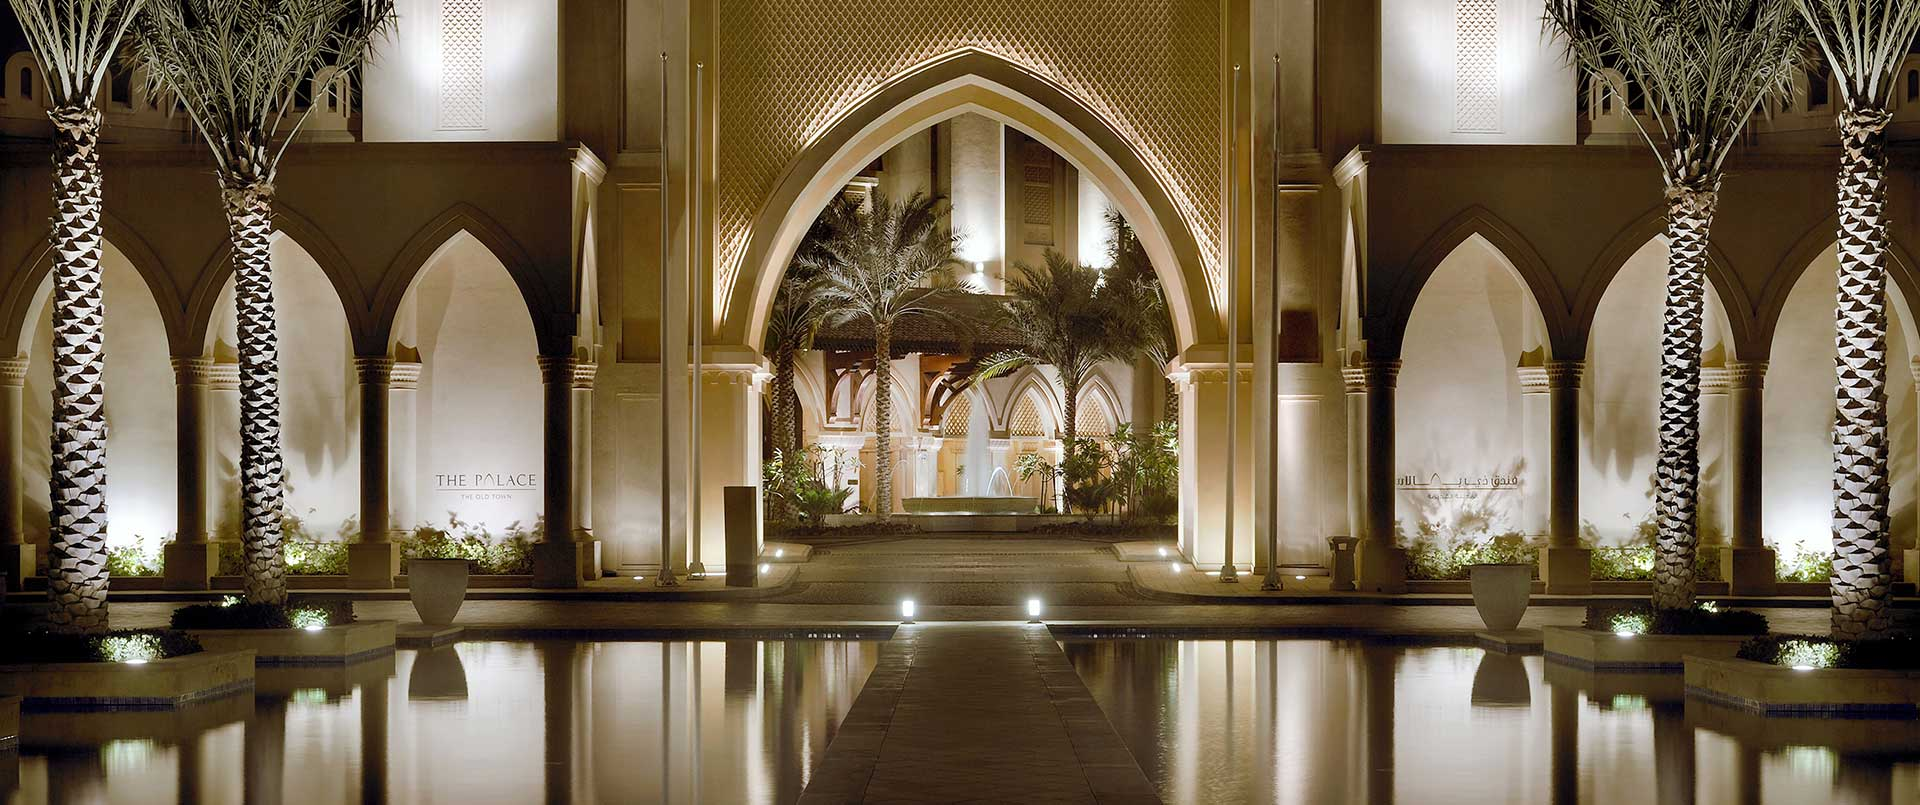 The Palace Downtown, Dubai